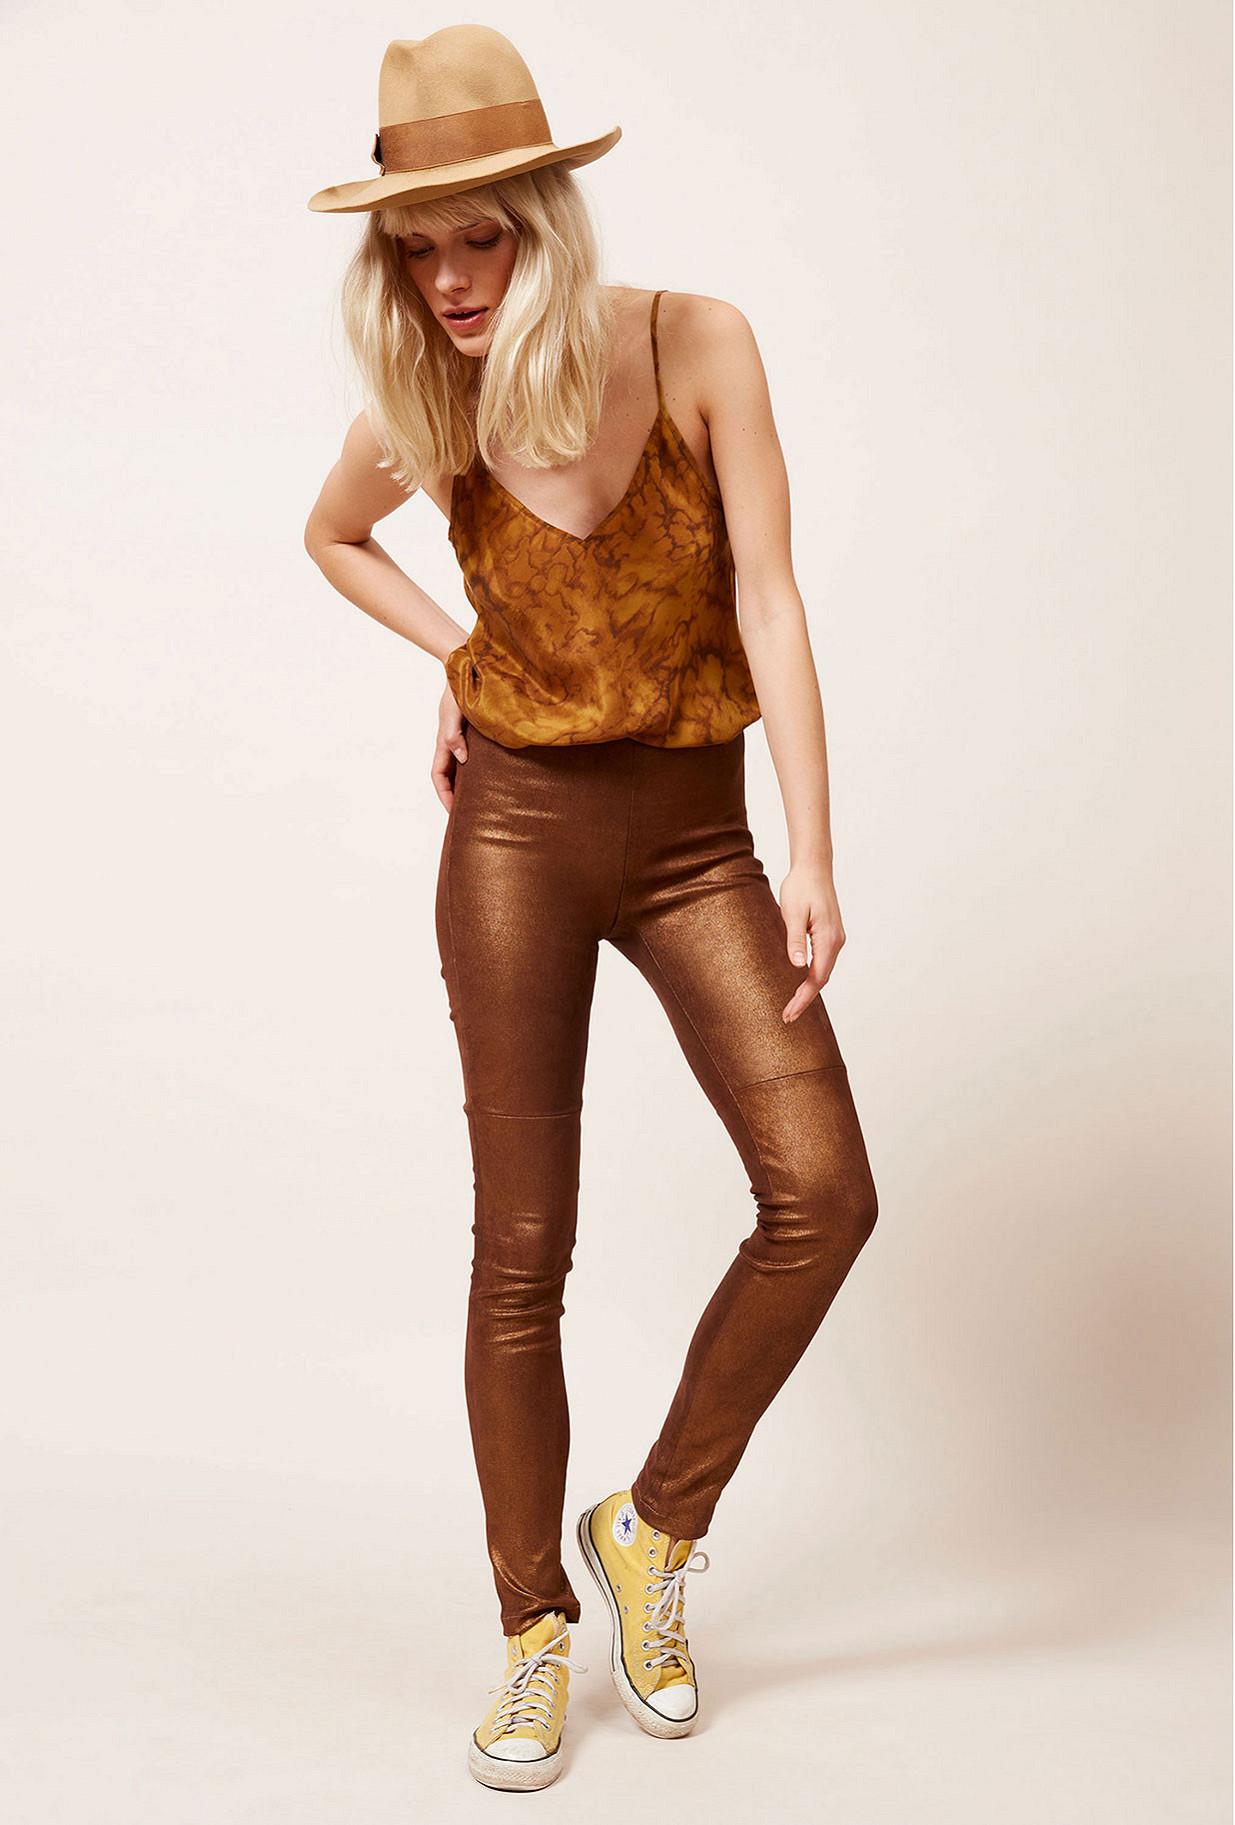 Paris clothes store Legging  Esther french designer fashion Paris